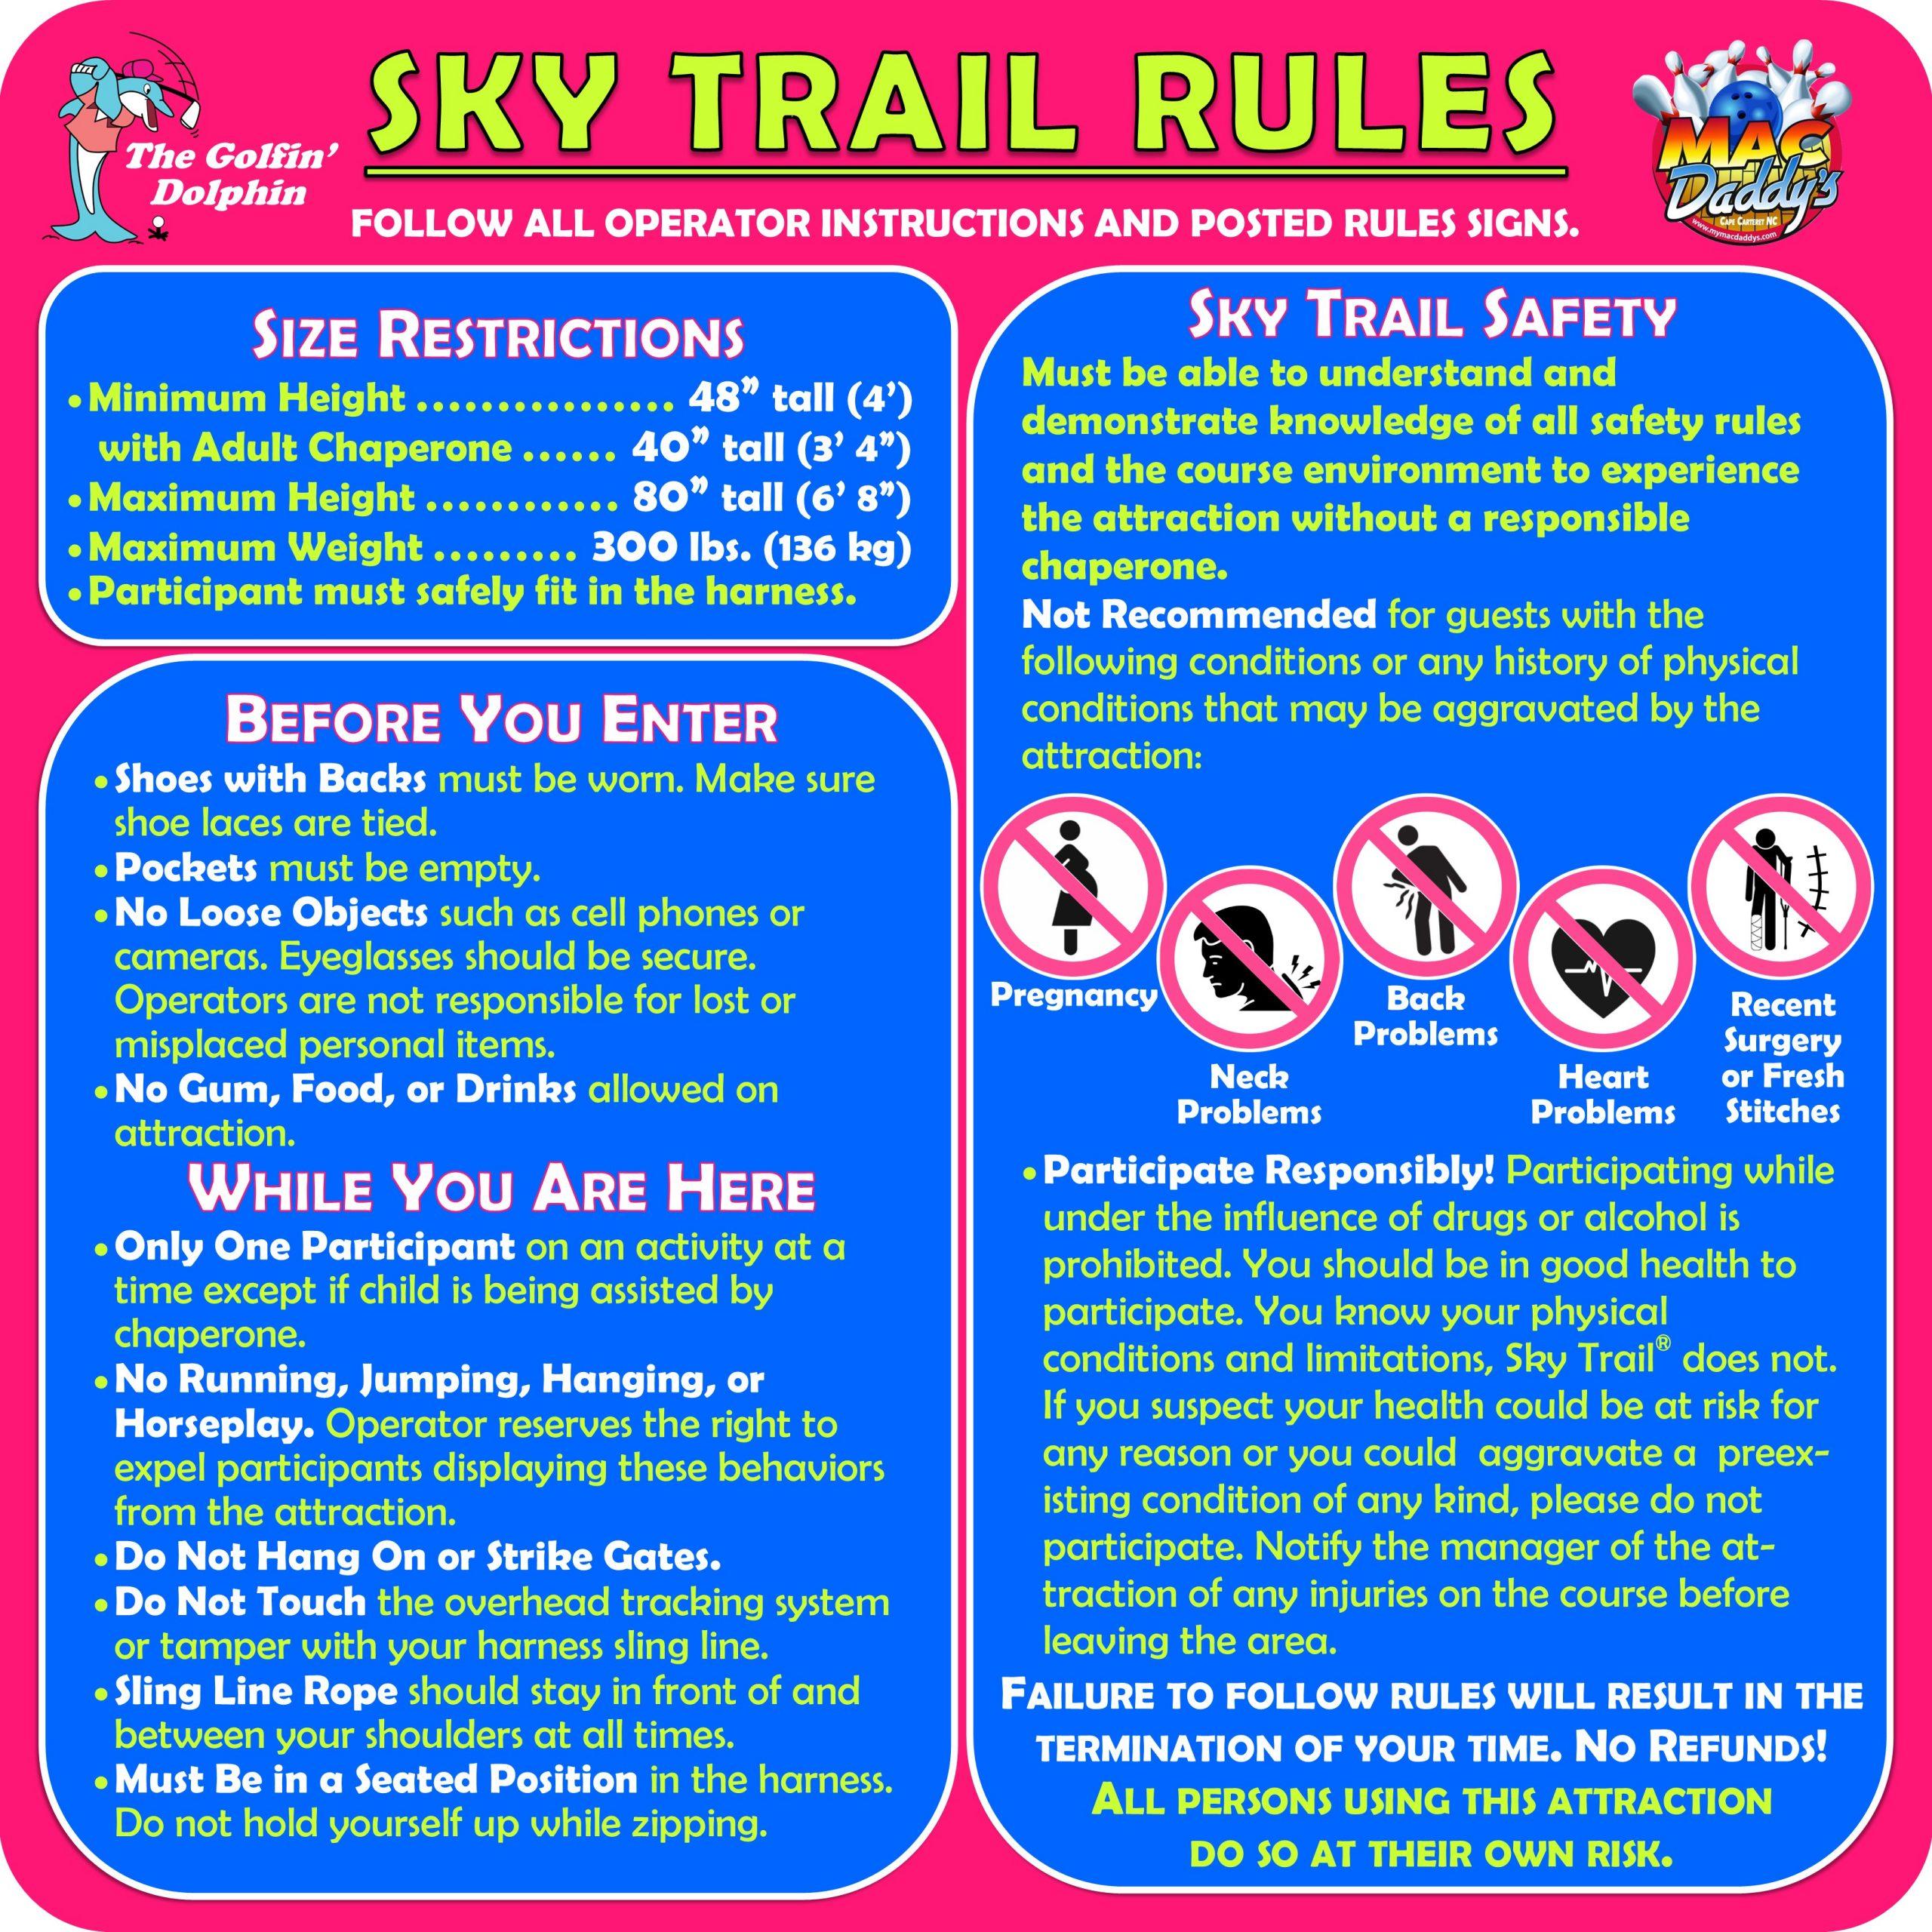 Sky Trail Rules